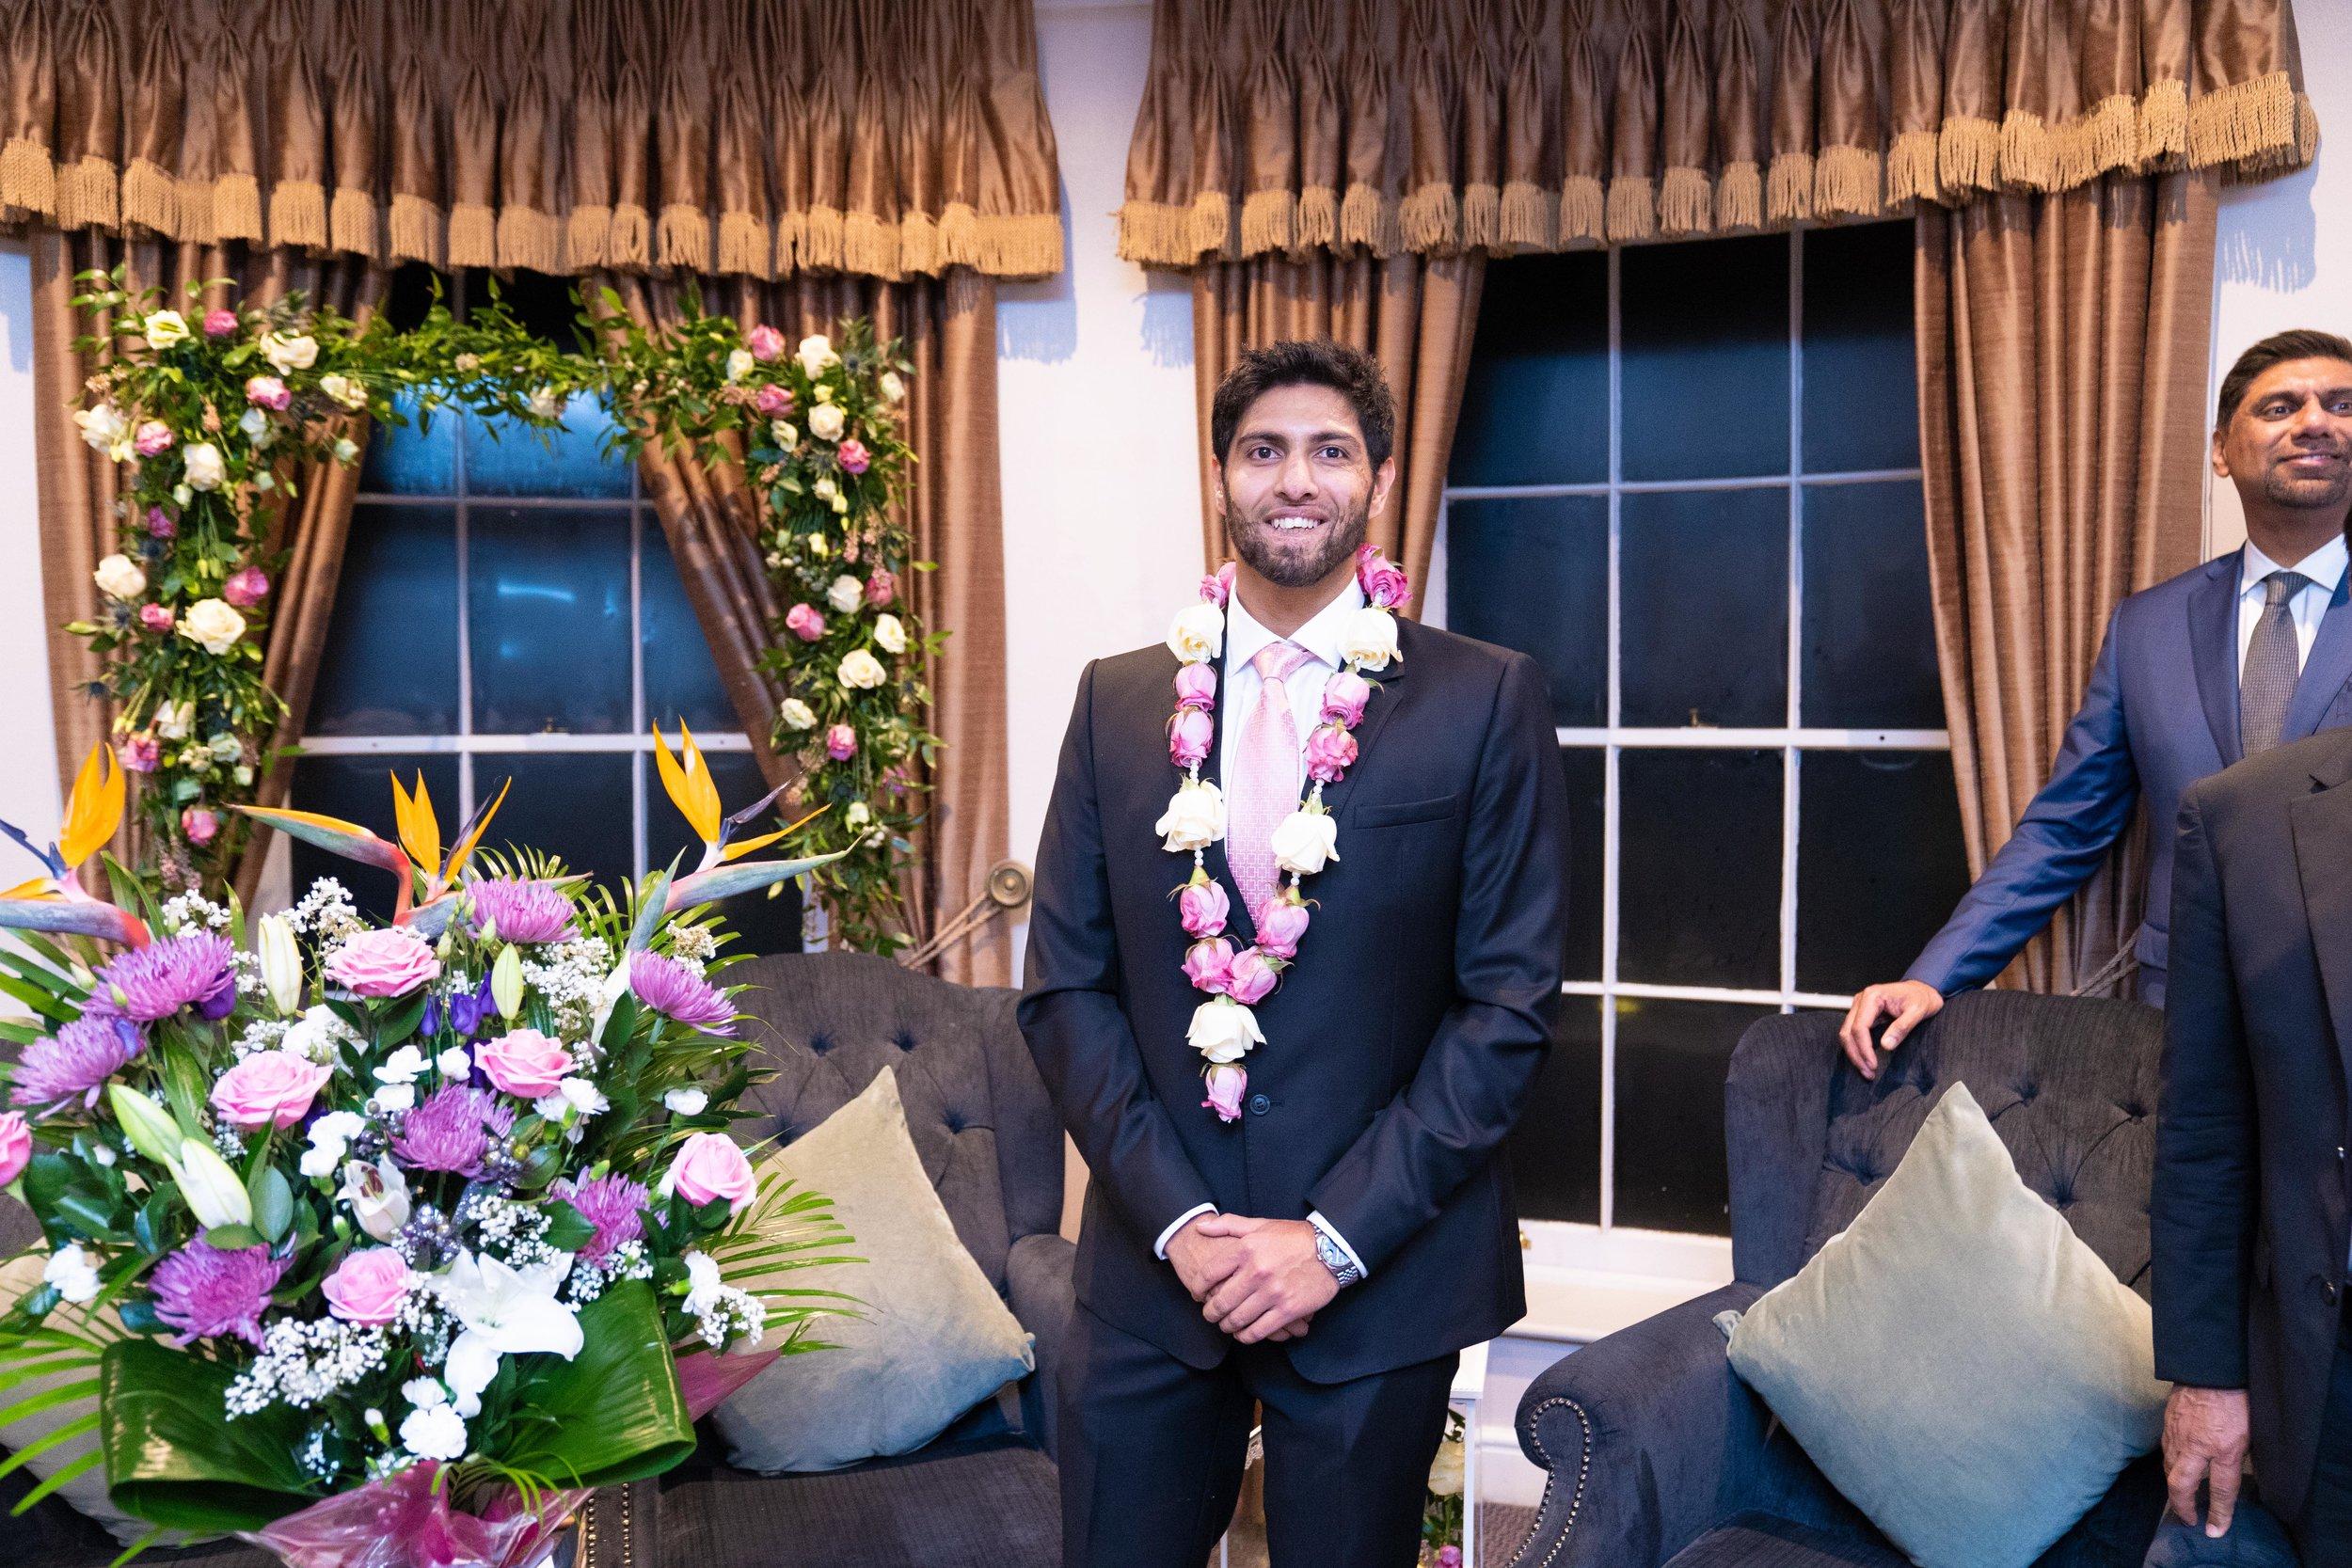 buckinghamshire-golf-club-winter-muslim-wedding-engagement-photography-videography-19